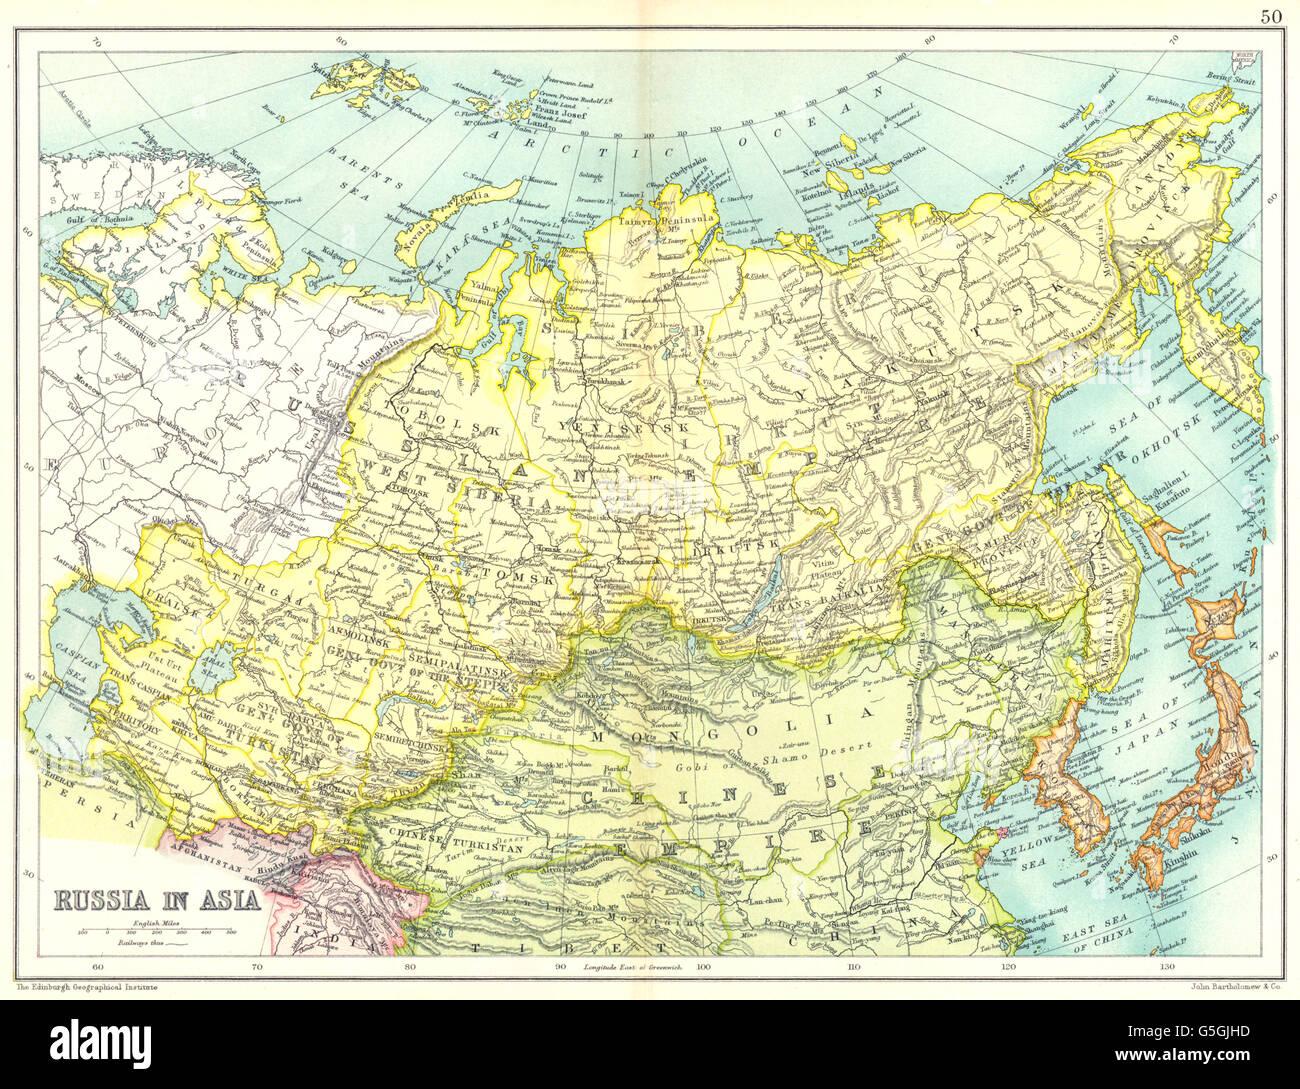 Karte Russland Asien.Russland In Asien Sibirien China Korea Japan Irkutsk